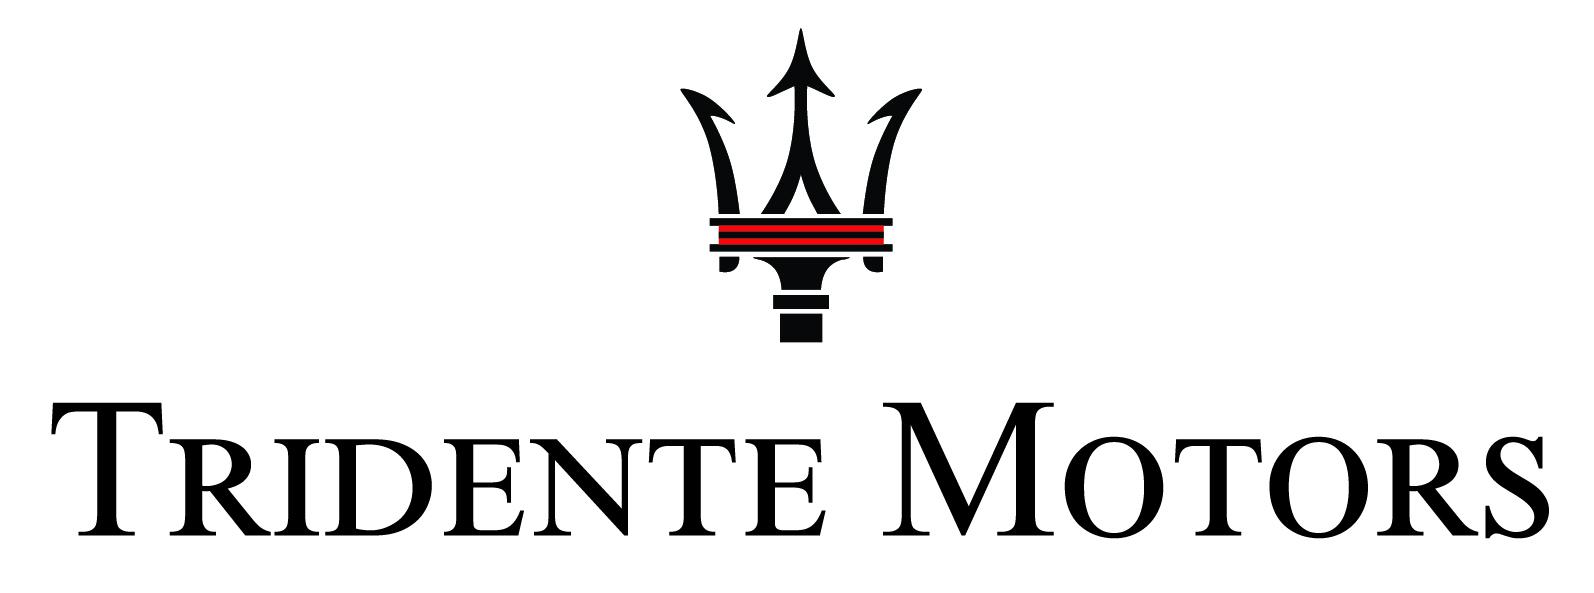 Tridente Motors